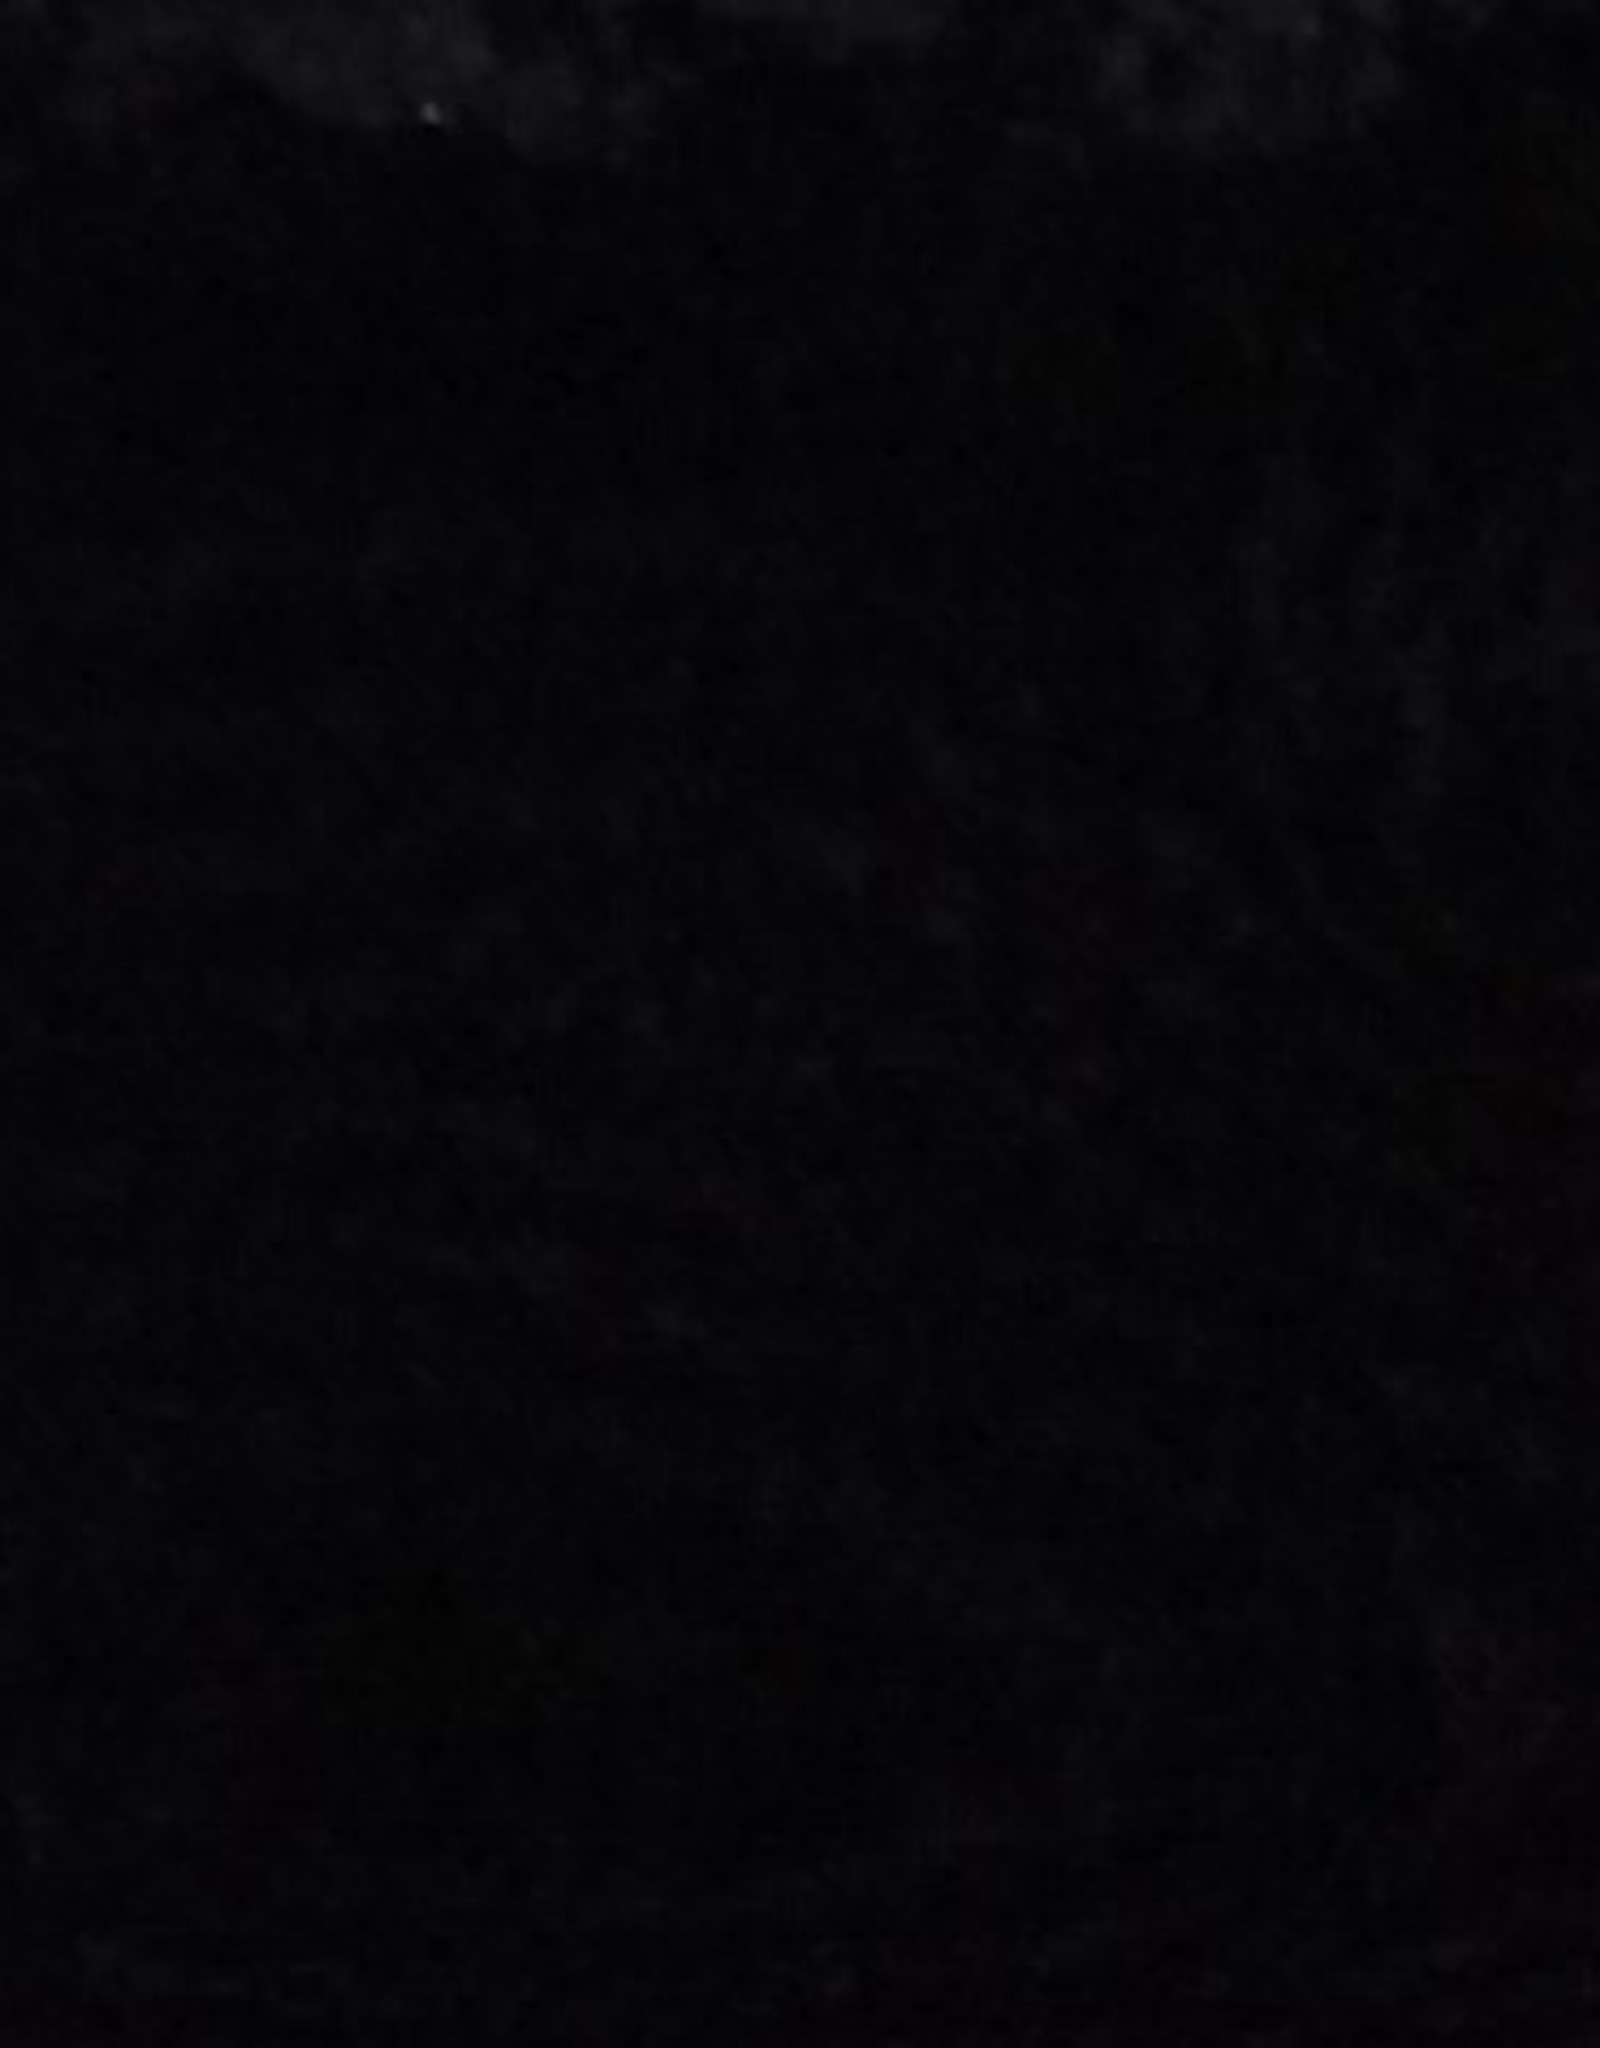 Chiffon 58 - 60 Inches Black (Yard)